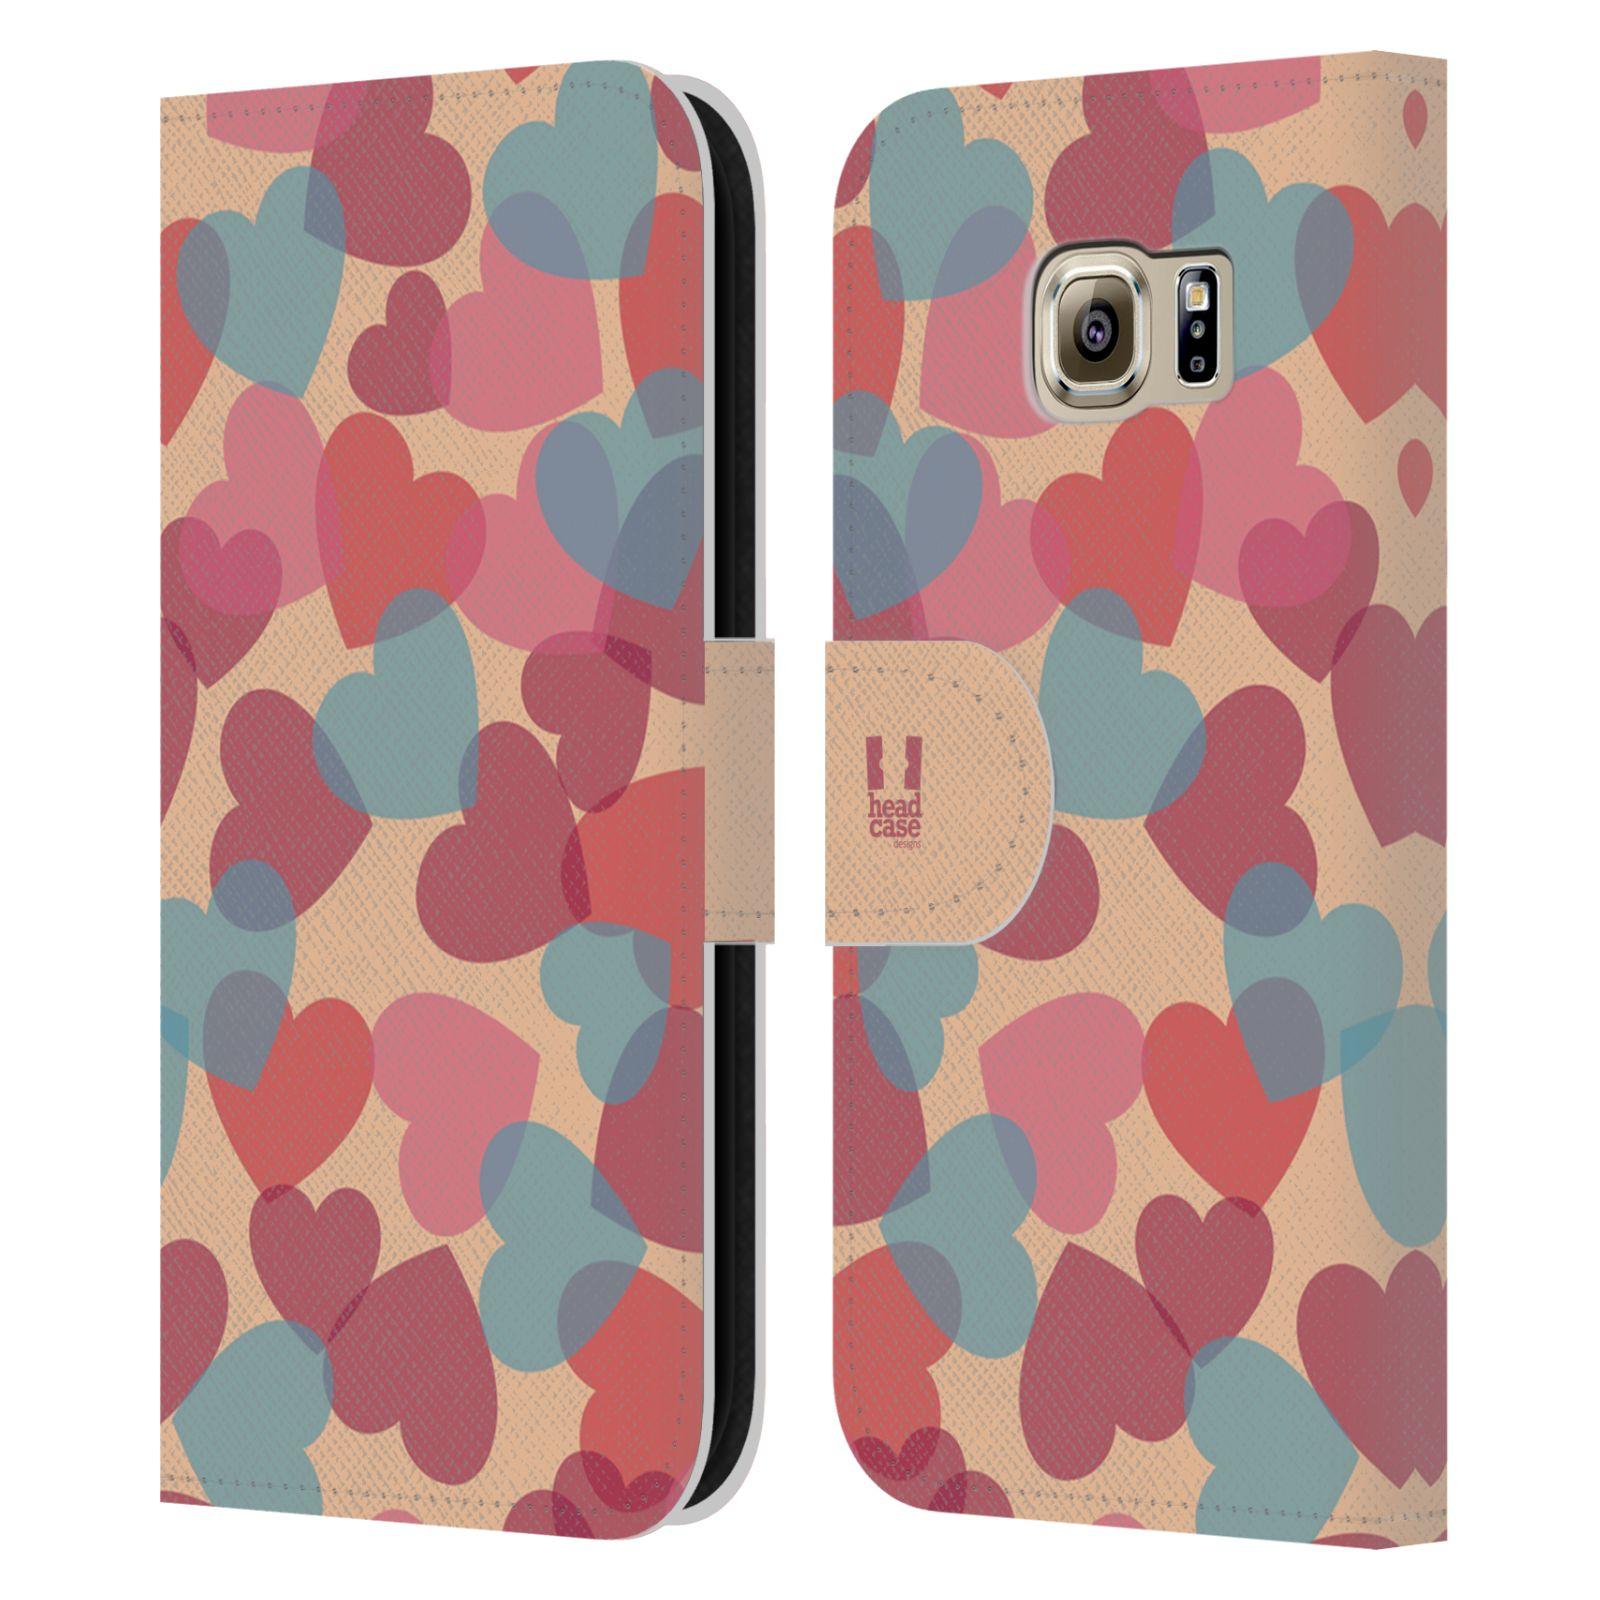 HEAD CASE Flipové pouzdro pro mobil Samsung Galaxy S6 (G9200) vzor prolínající se srdíčka, srdce, láska, růžová